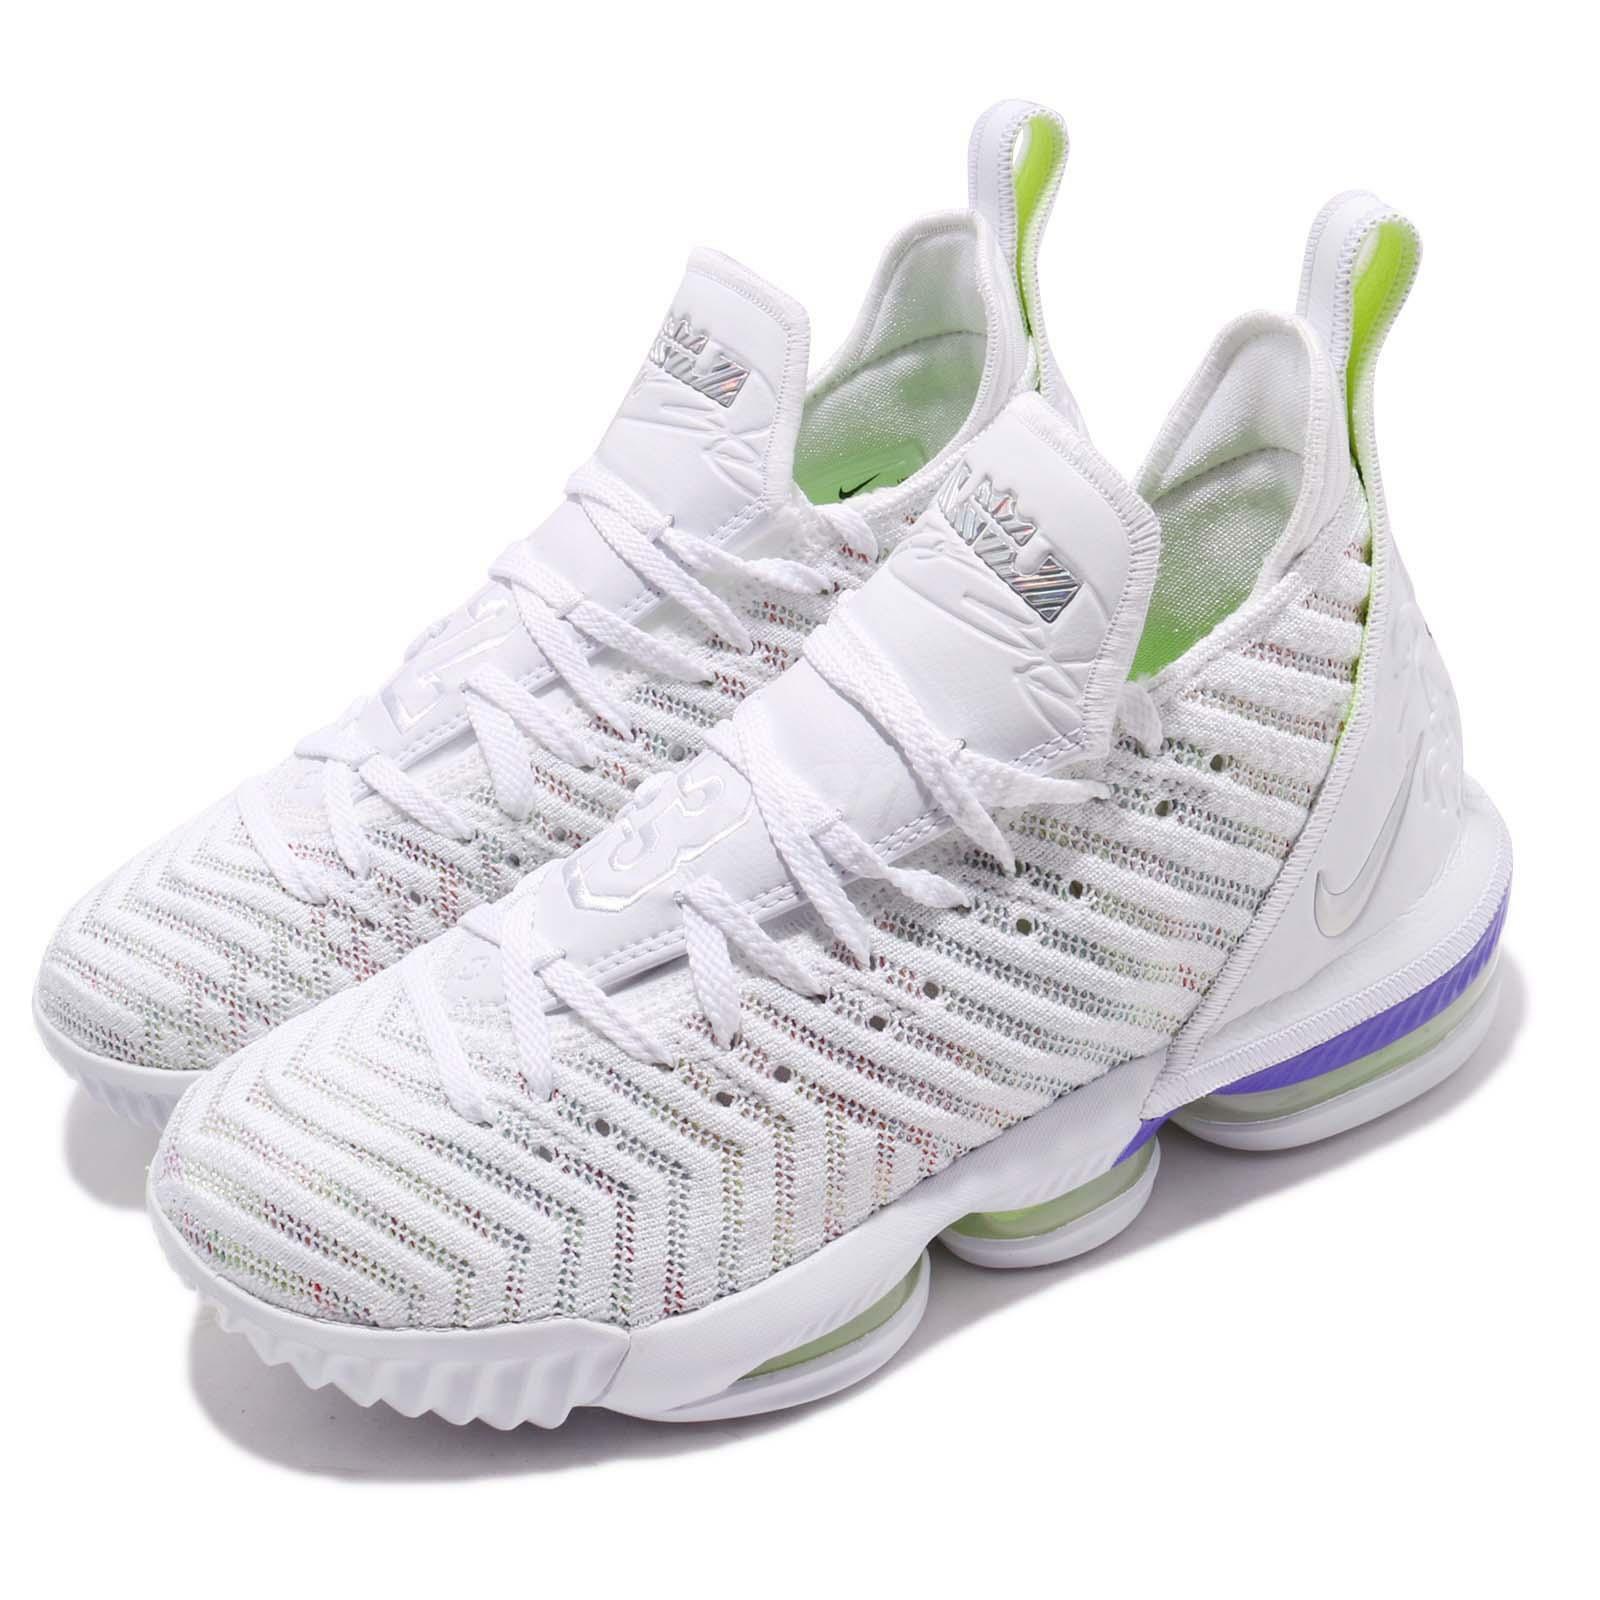 Nike Lebron XVI EP 16 Buzz Lightyear James White Men Basketball shoes AO2595-102